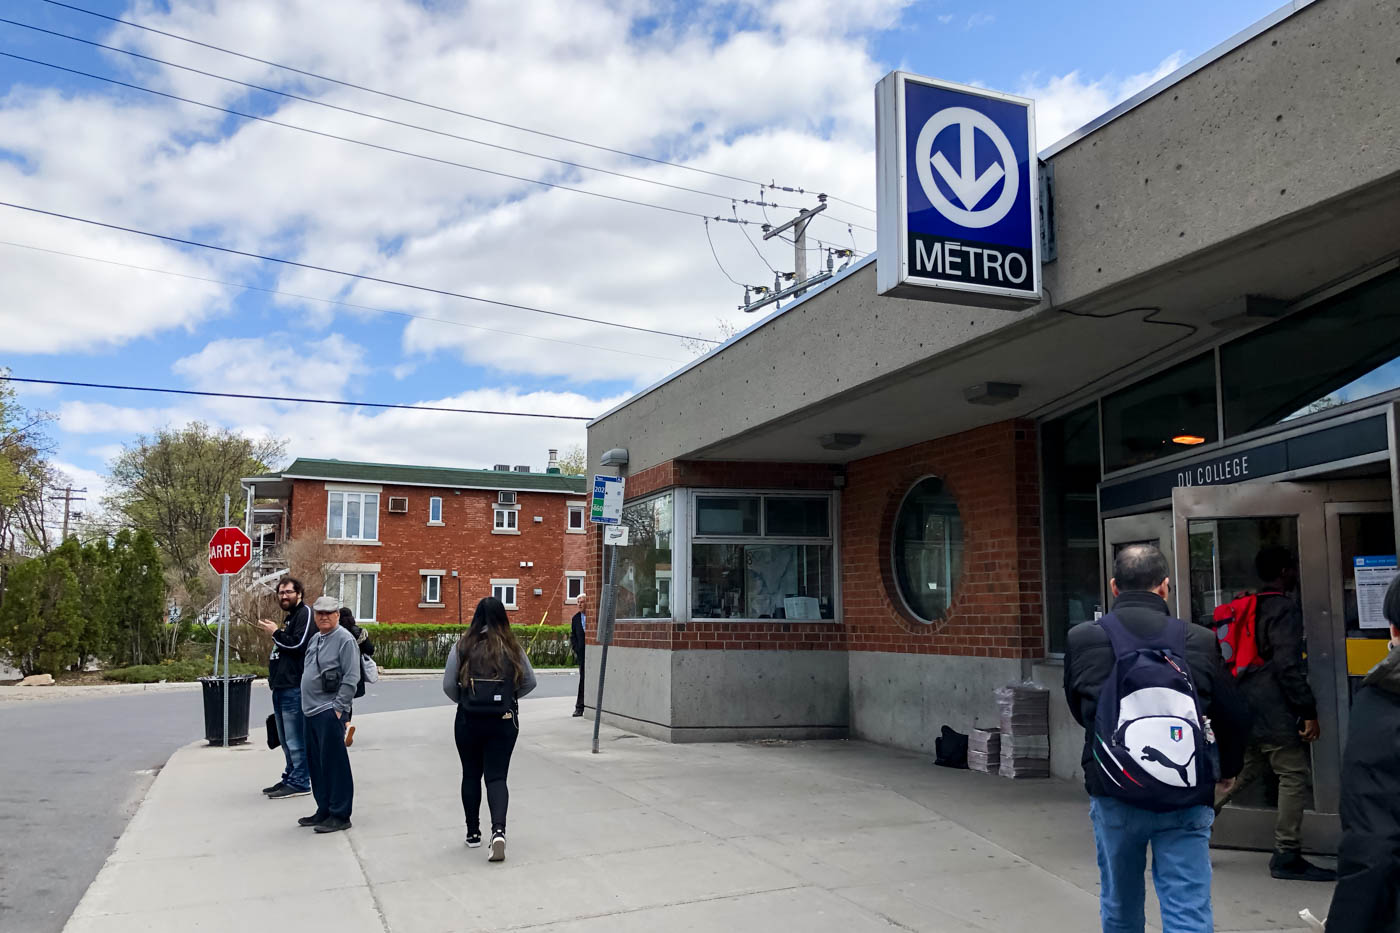 Du College Metro Station